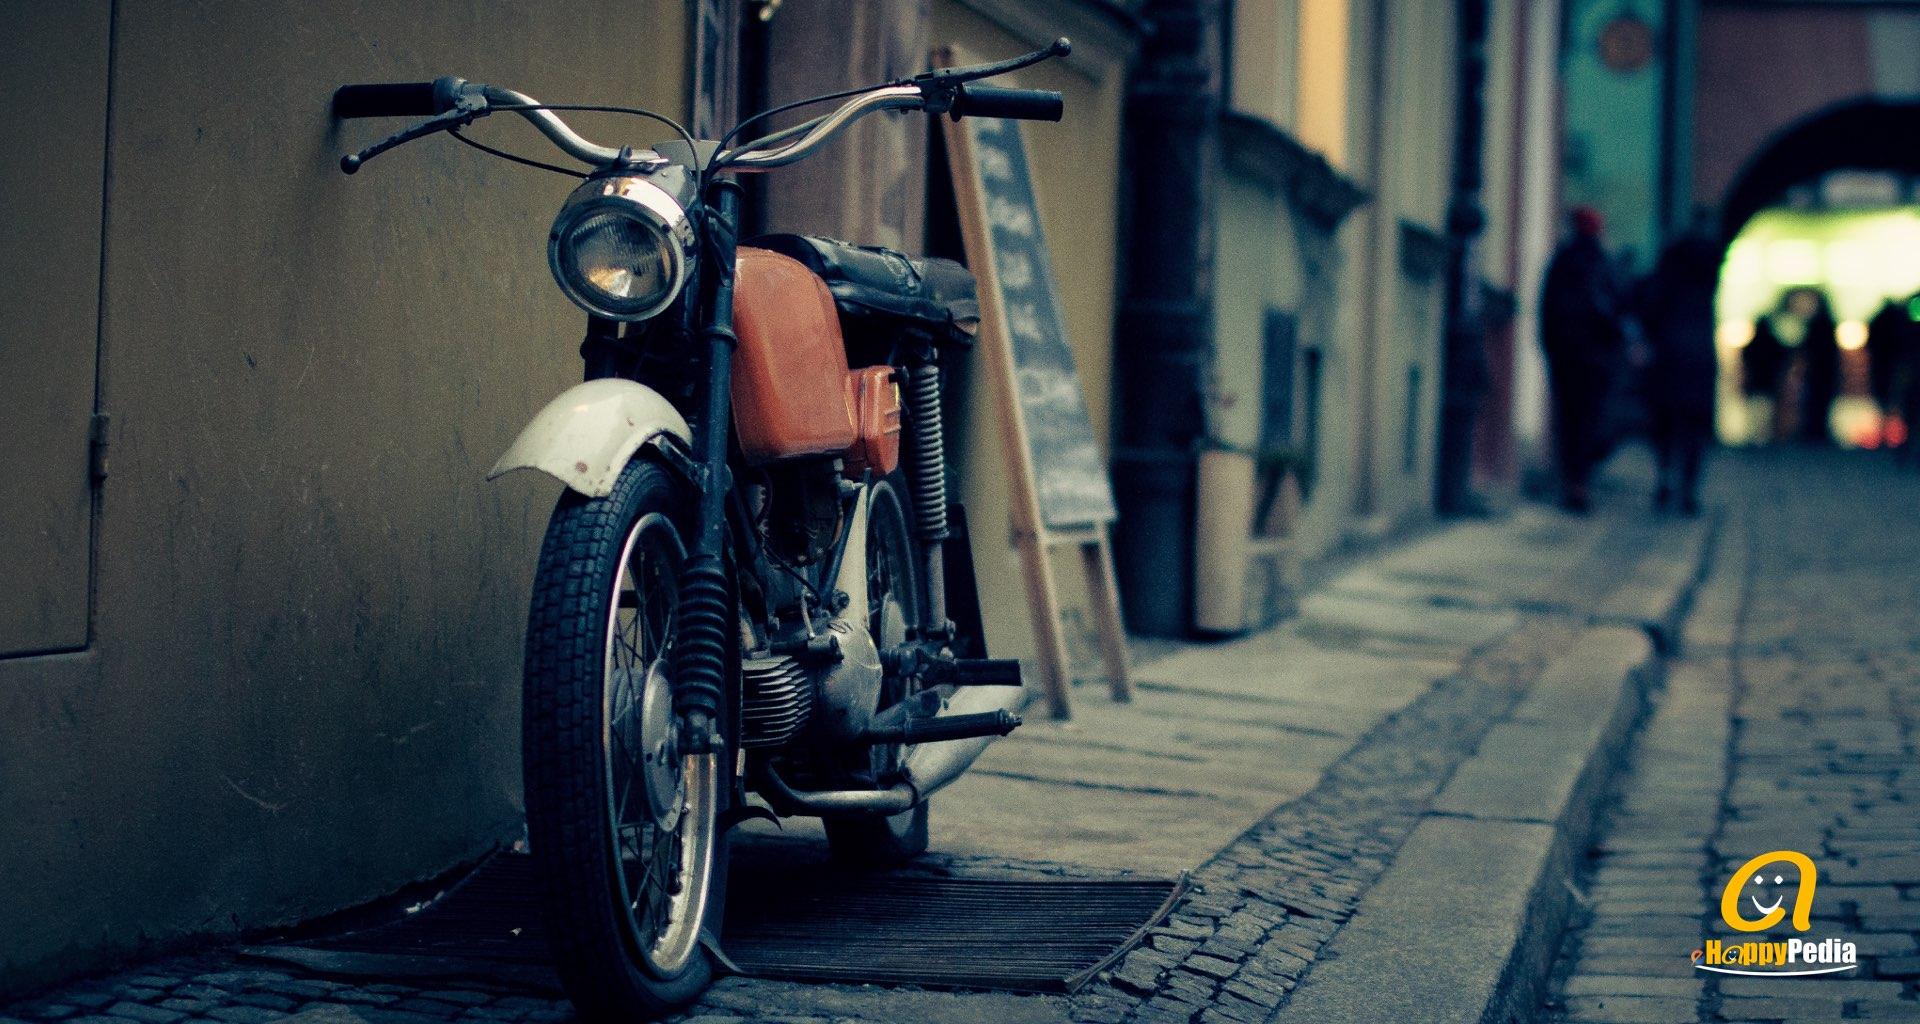 blog - street motocycle dark.jpeg